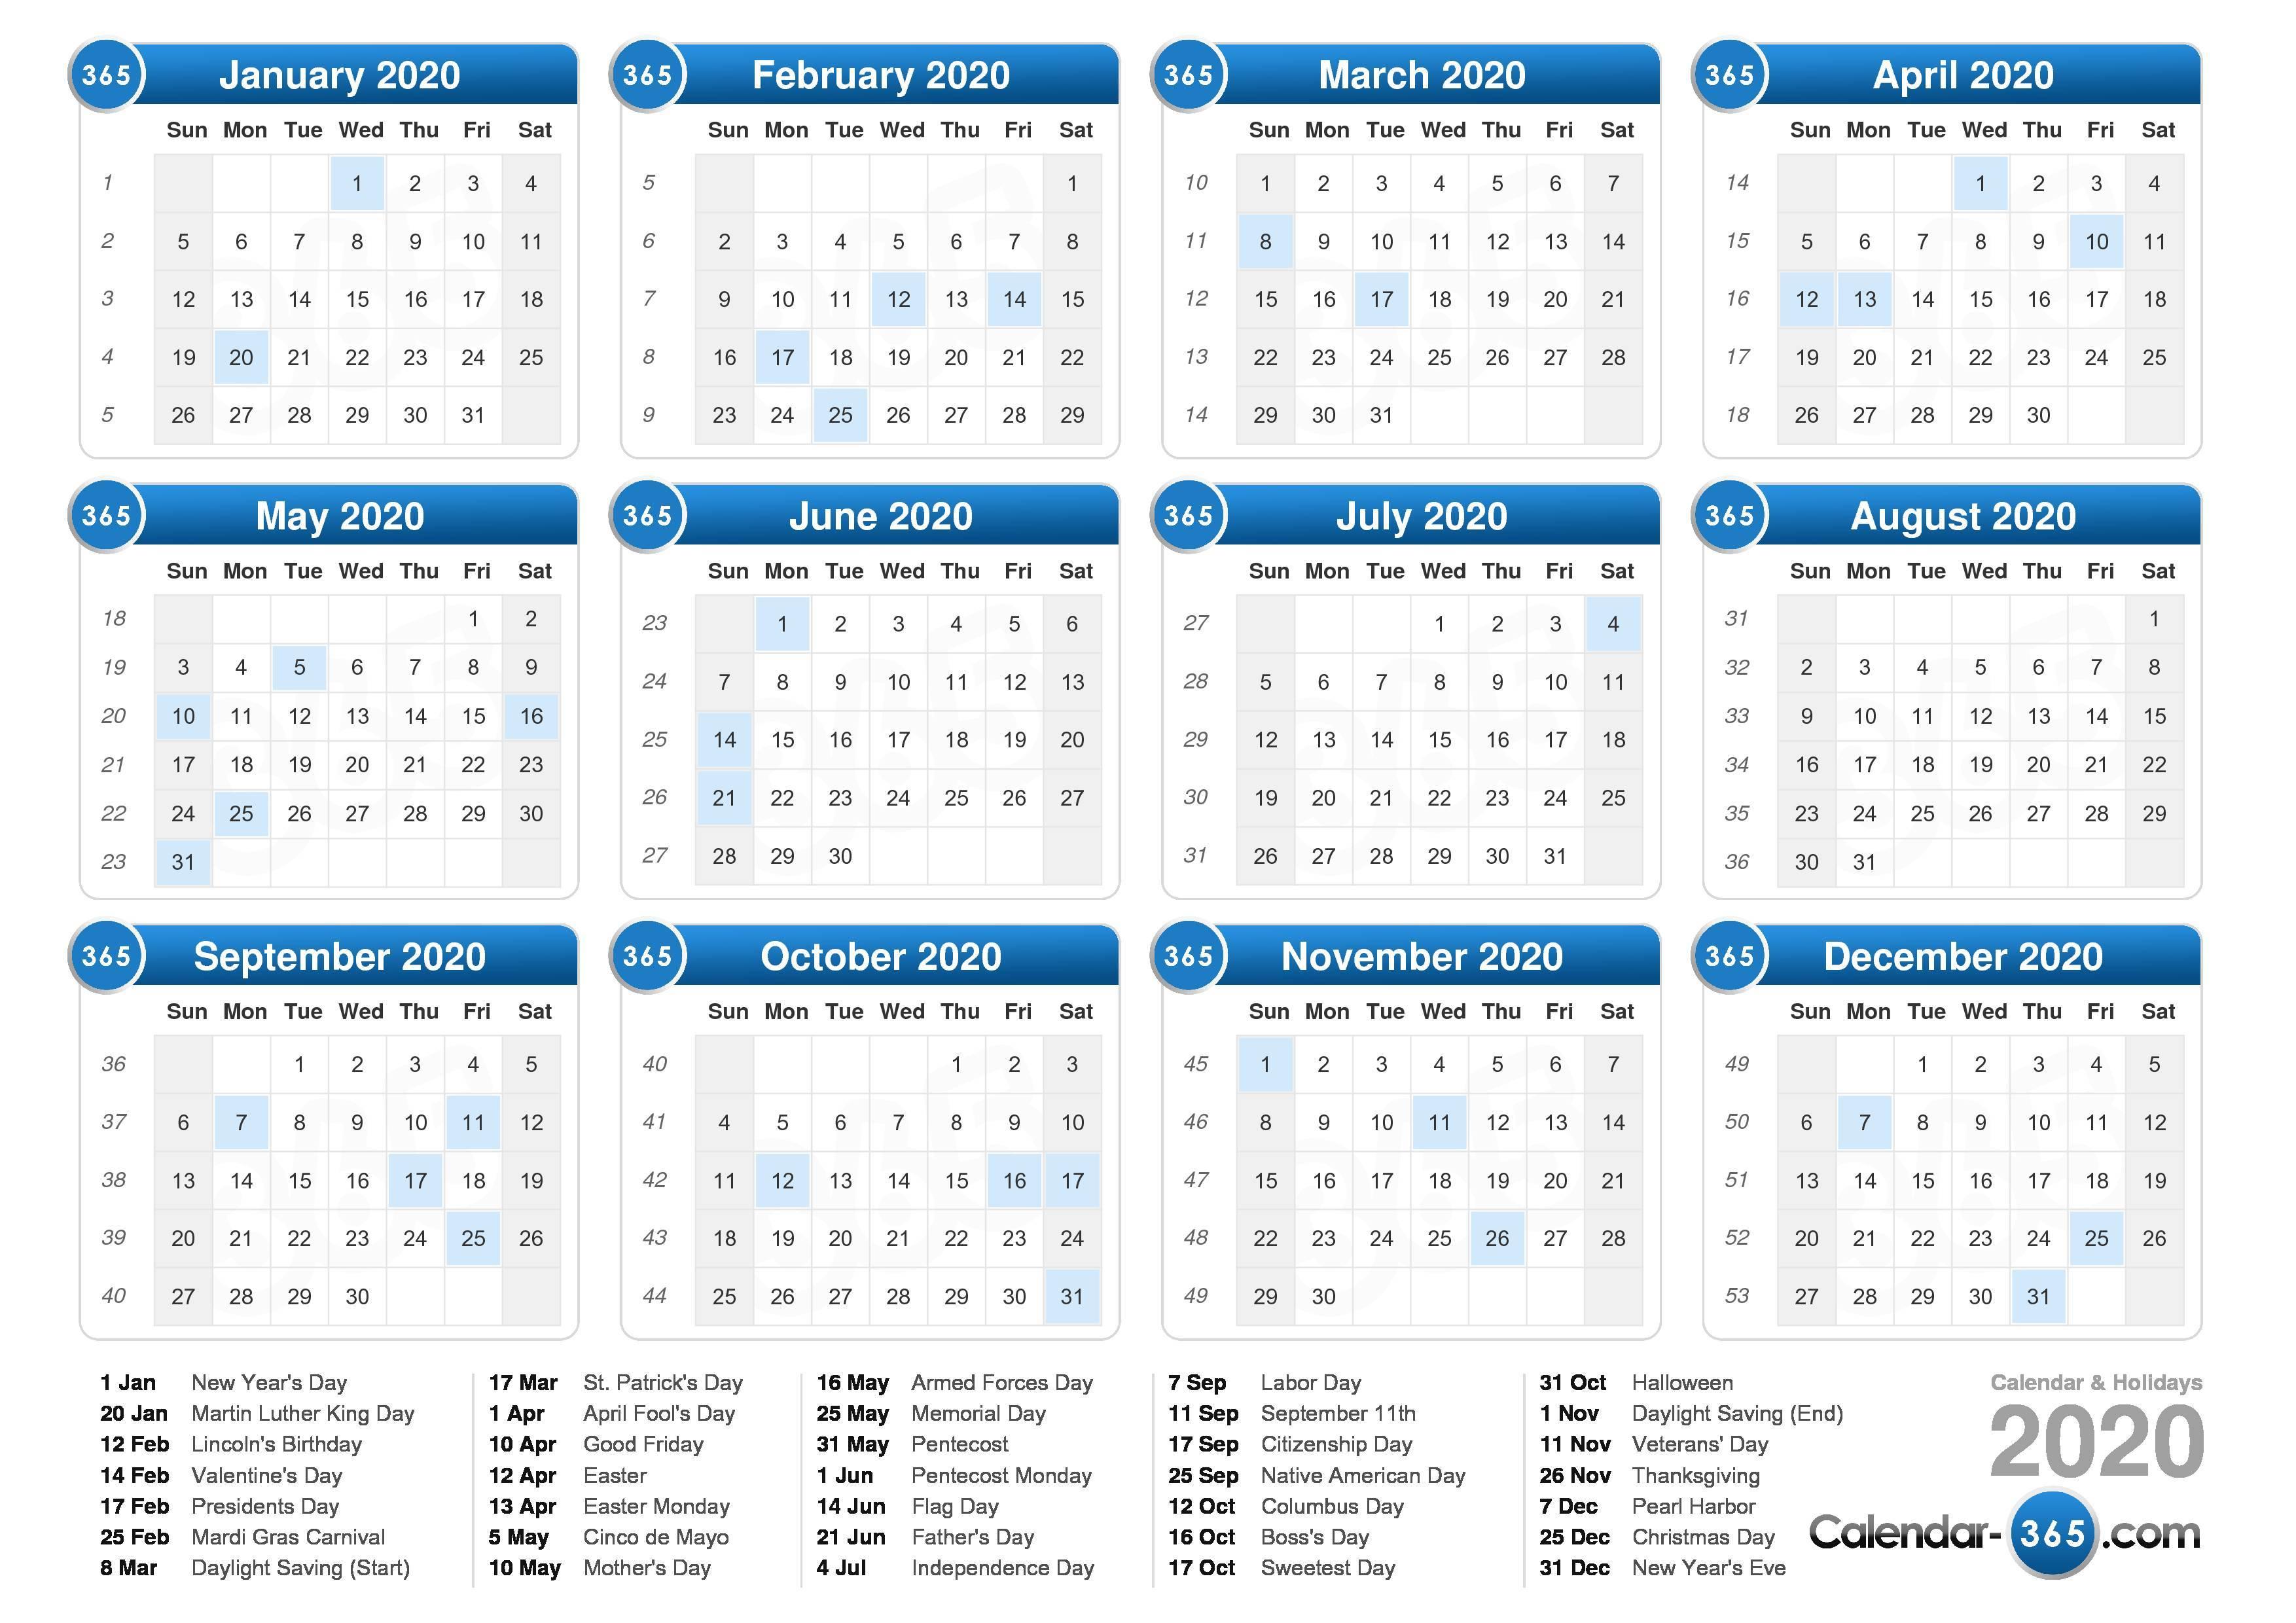 2020 Calendar pertaining to 2020 Calendar Starting On Monday